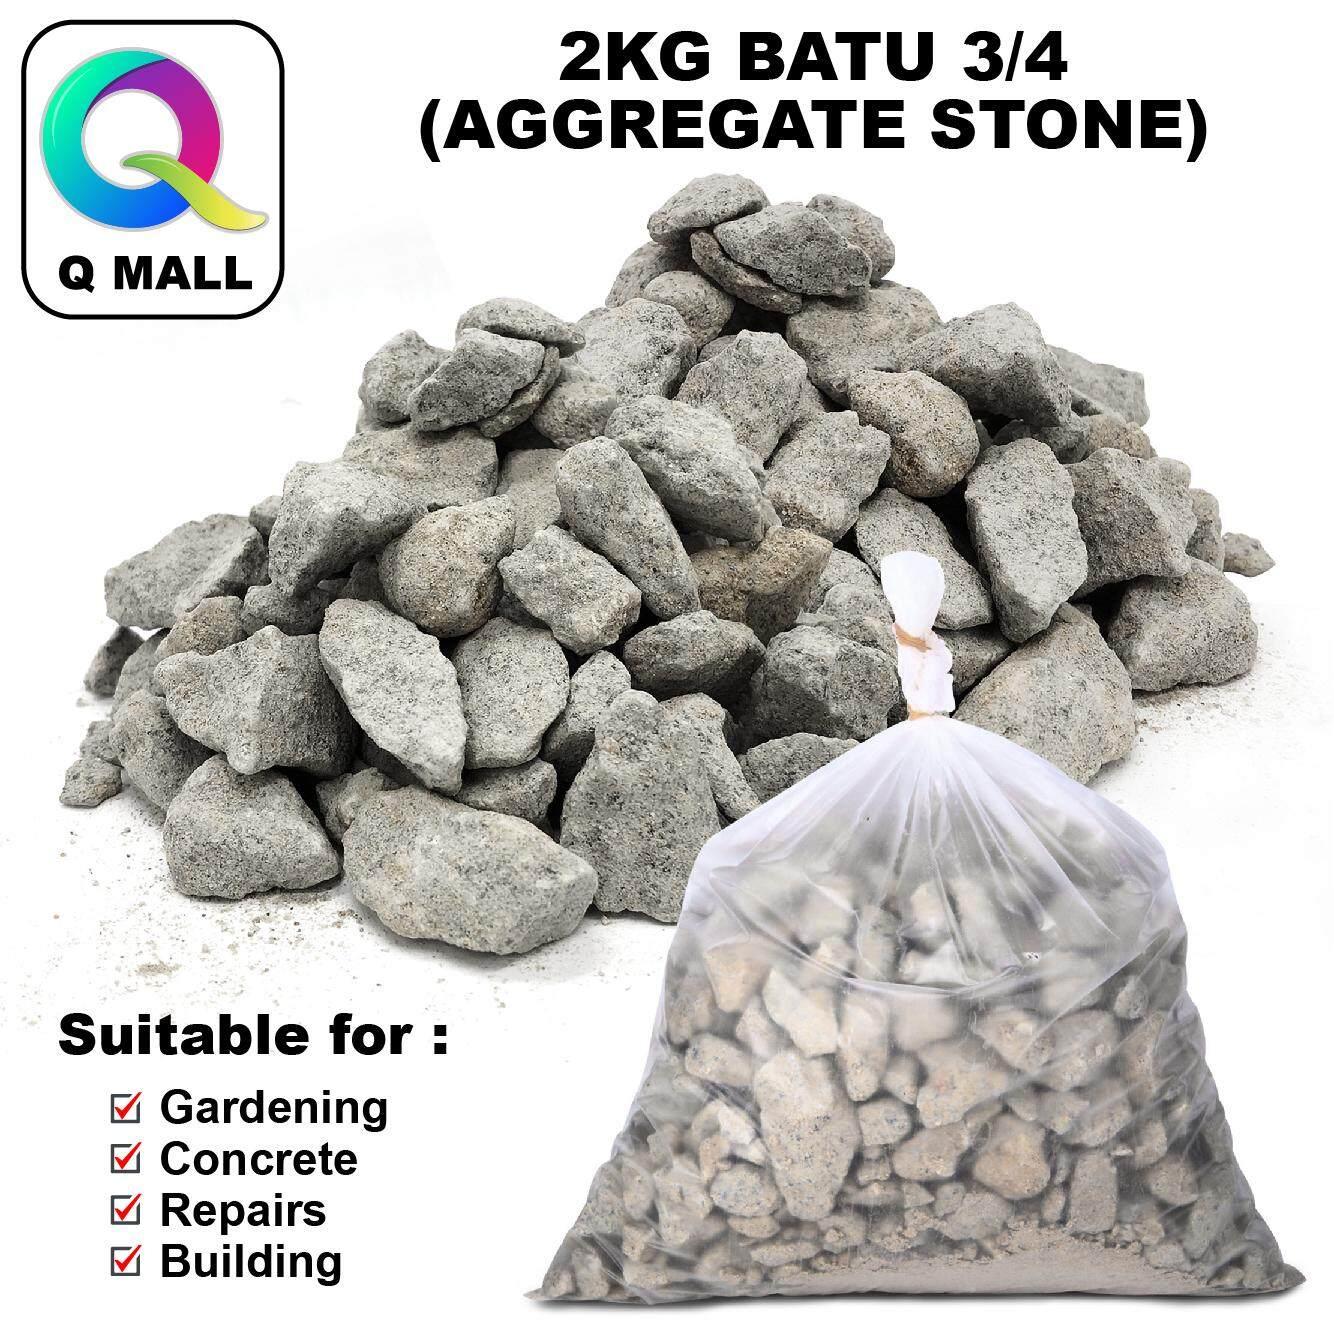 Q MALL 2KG Concrete Stone 3/4 / Batu Concrete 3/4 for base material under Construction foundations, roads, and railroads.